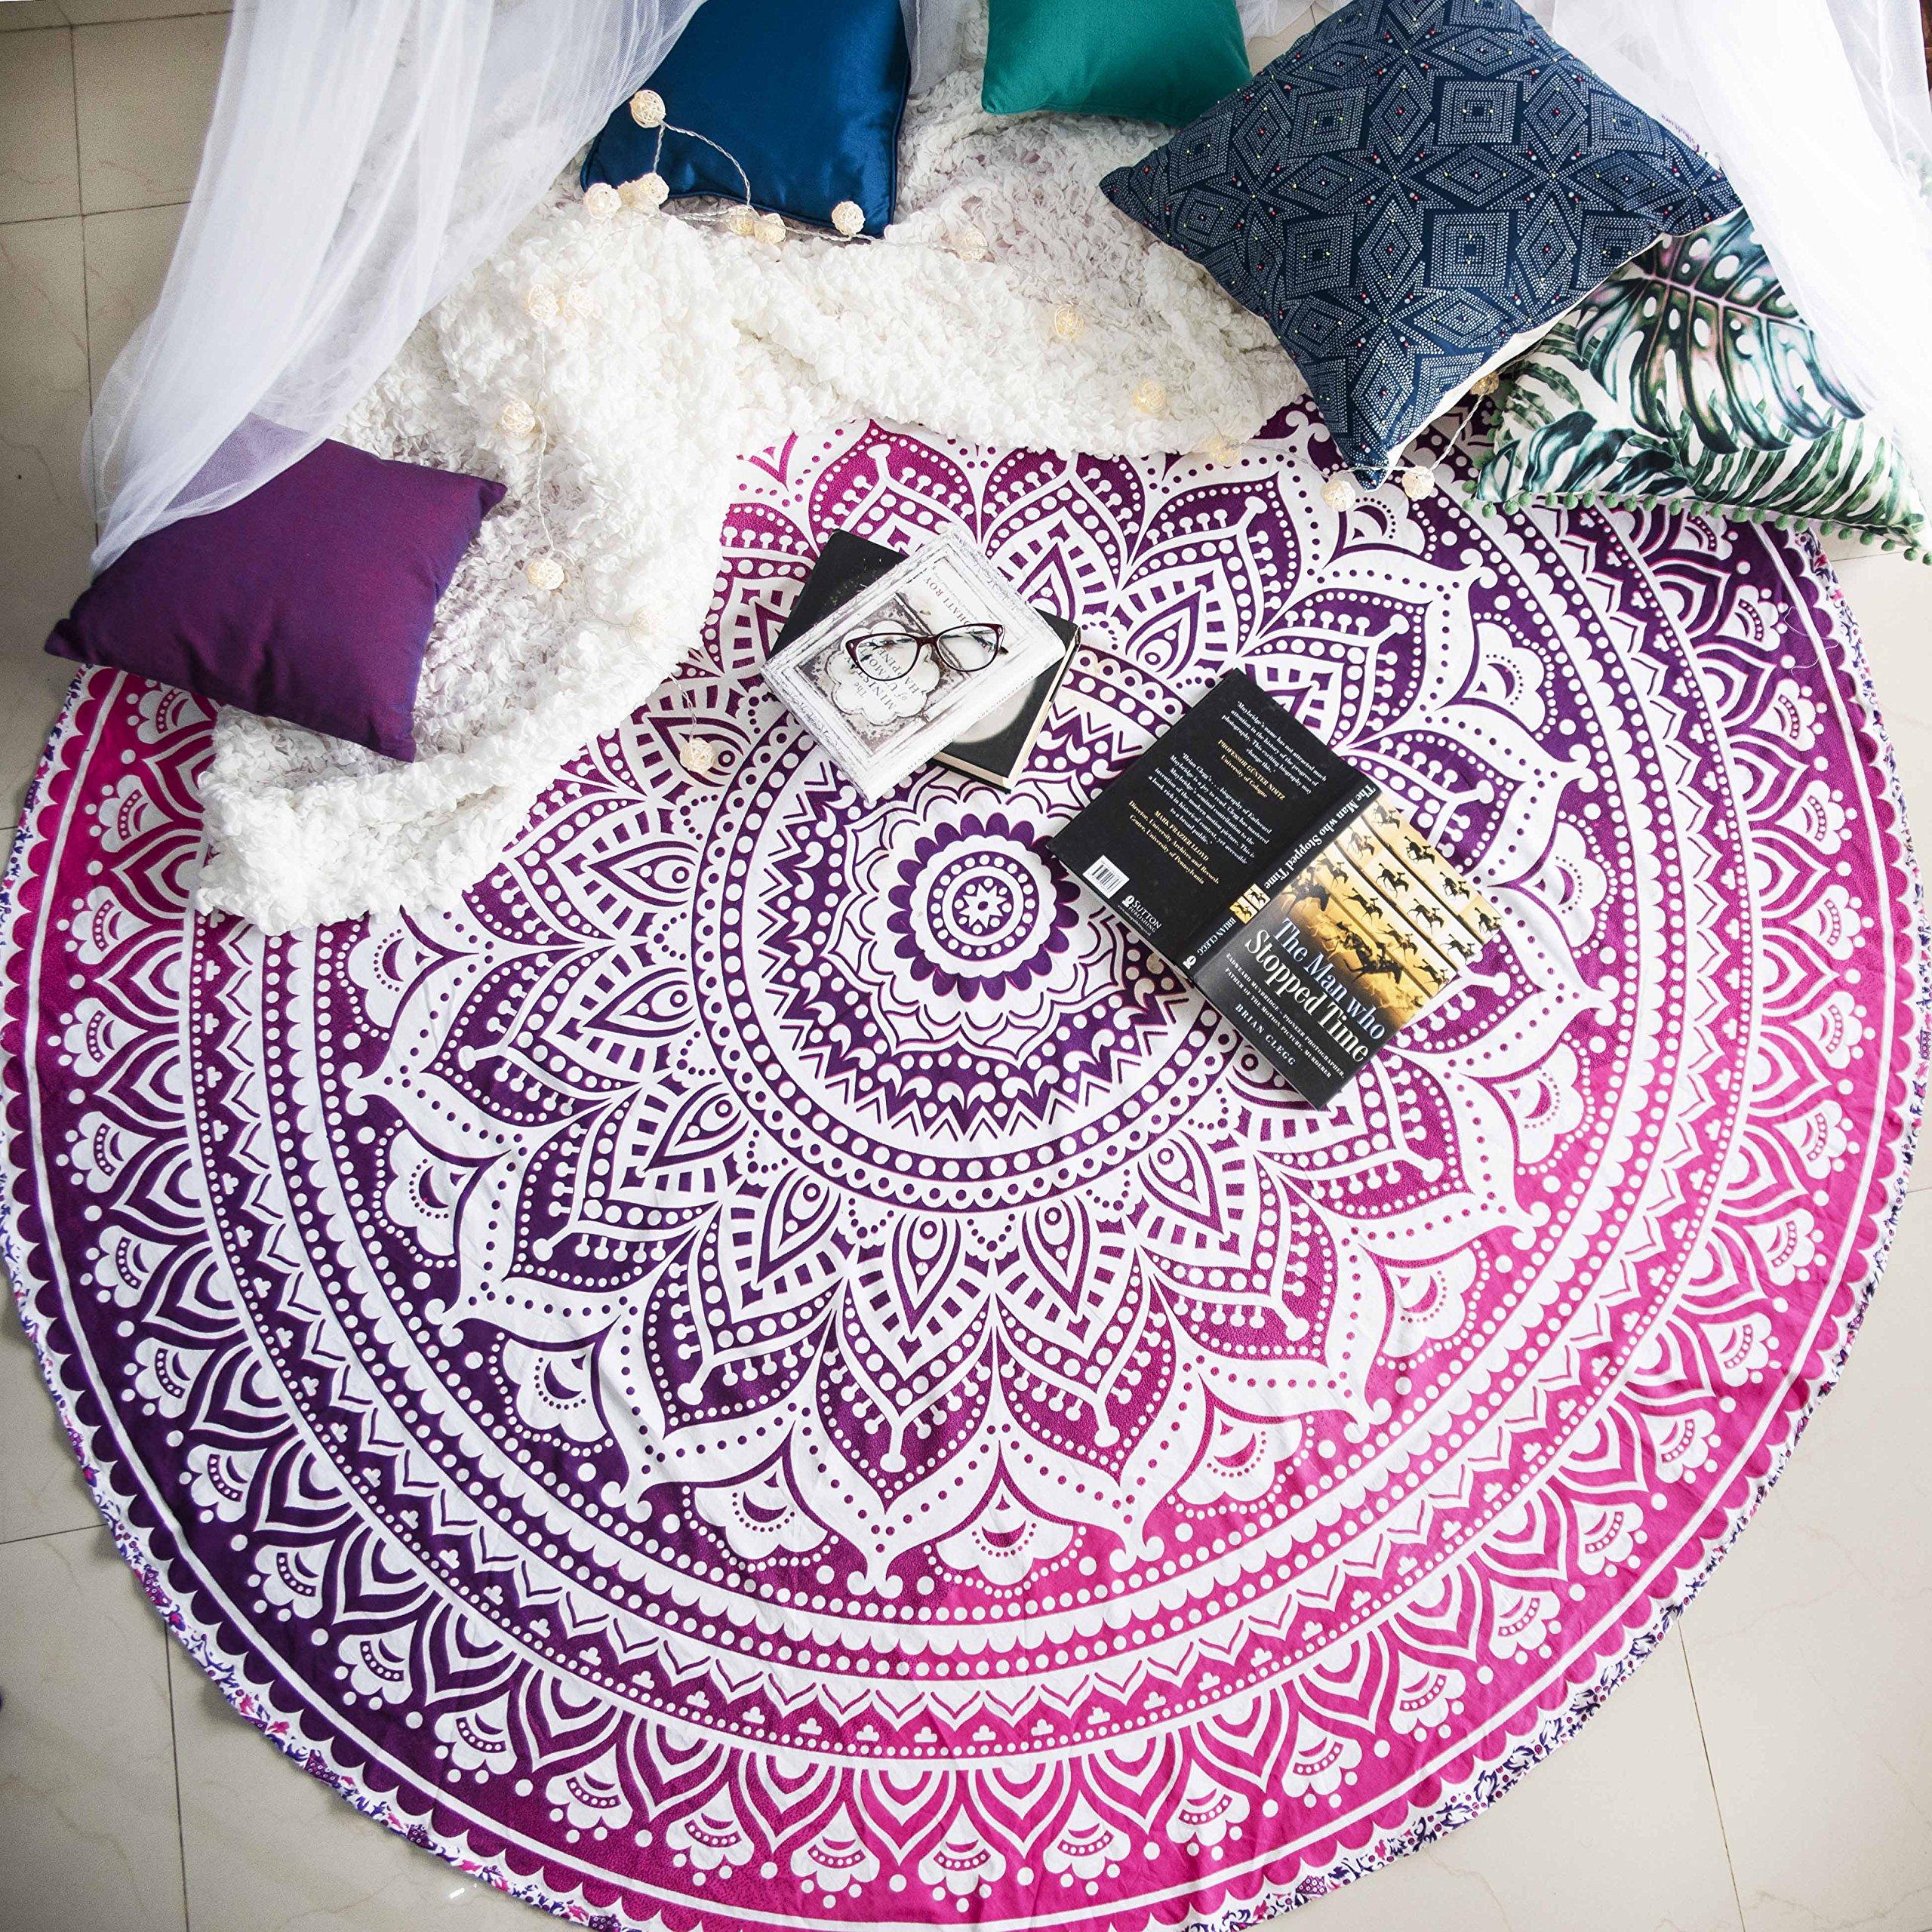 Magenta Marvel Mandala Round Tapestry Hippie Indian Mandala Beach Roundie Picnic Table Throw Hippy Bohemian Spread Boho Gypsy Cotton Tablecloth Beach Towel Meditation Round Yoga Mat - 72 Inches, Pink